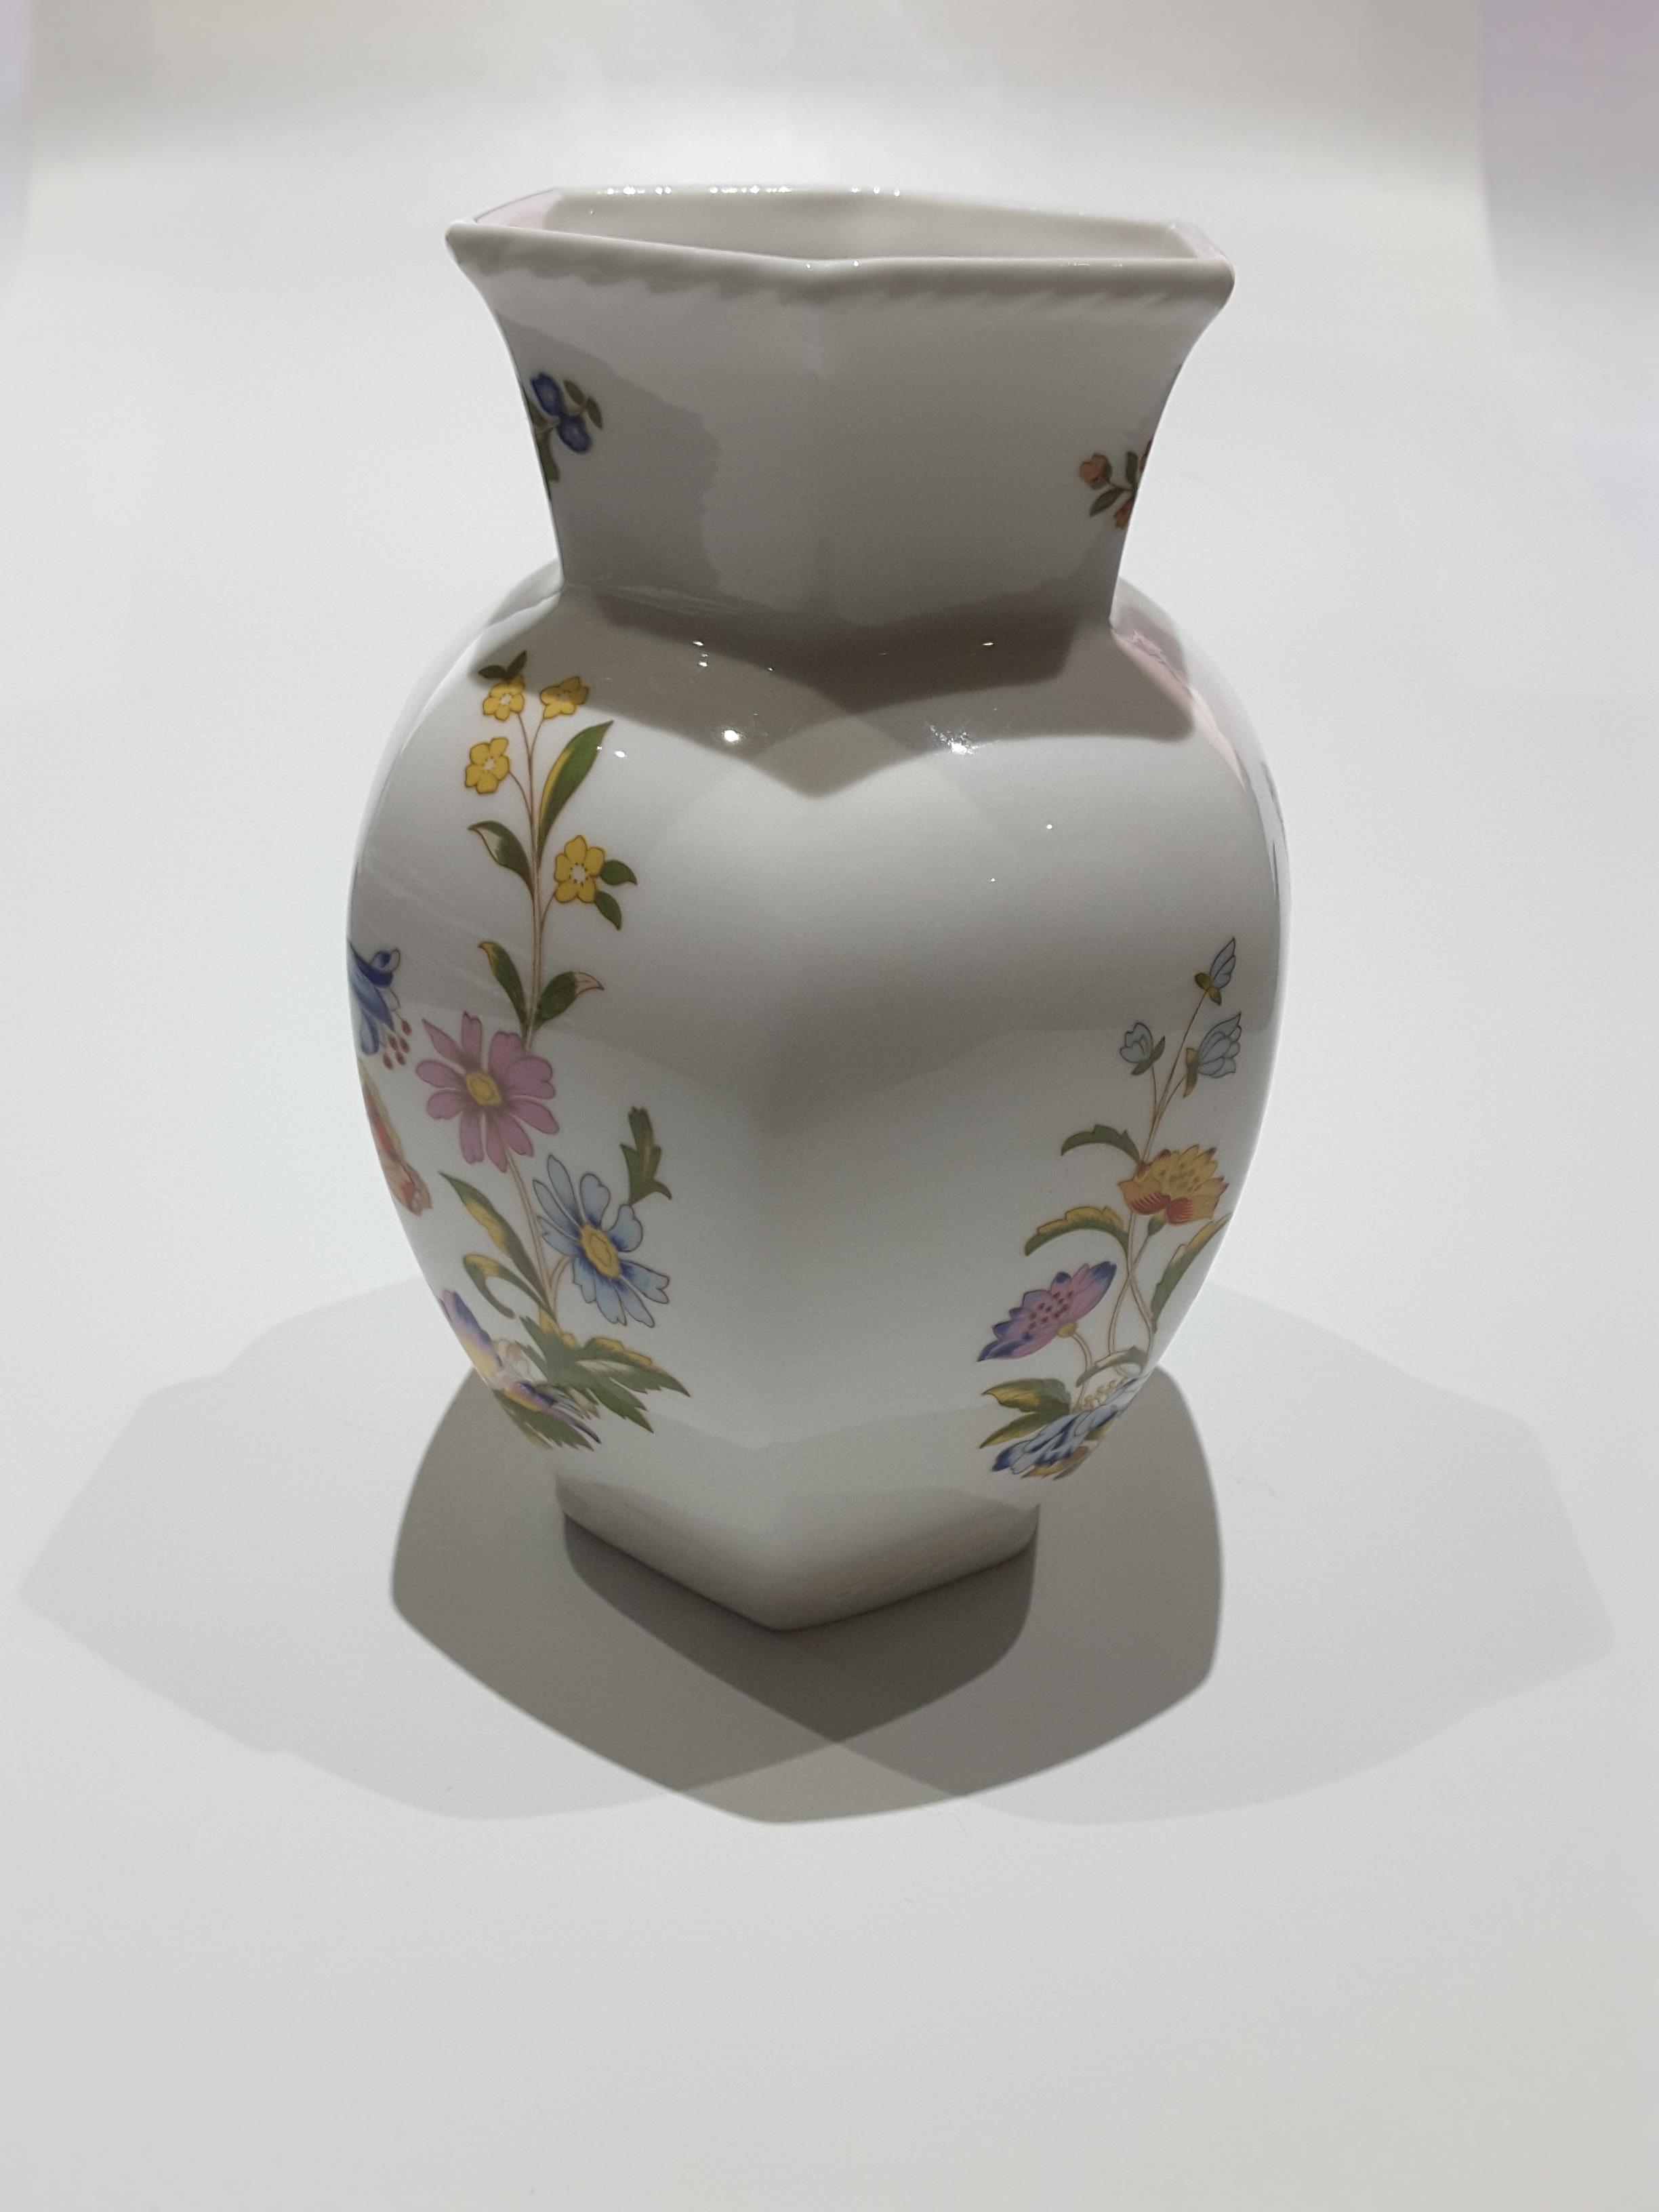 Lot 251 - Aynsley Cottage Garden Hexagonal Vase